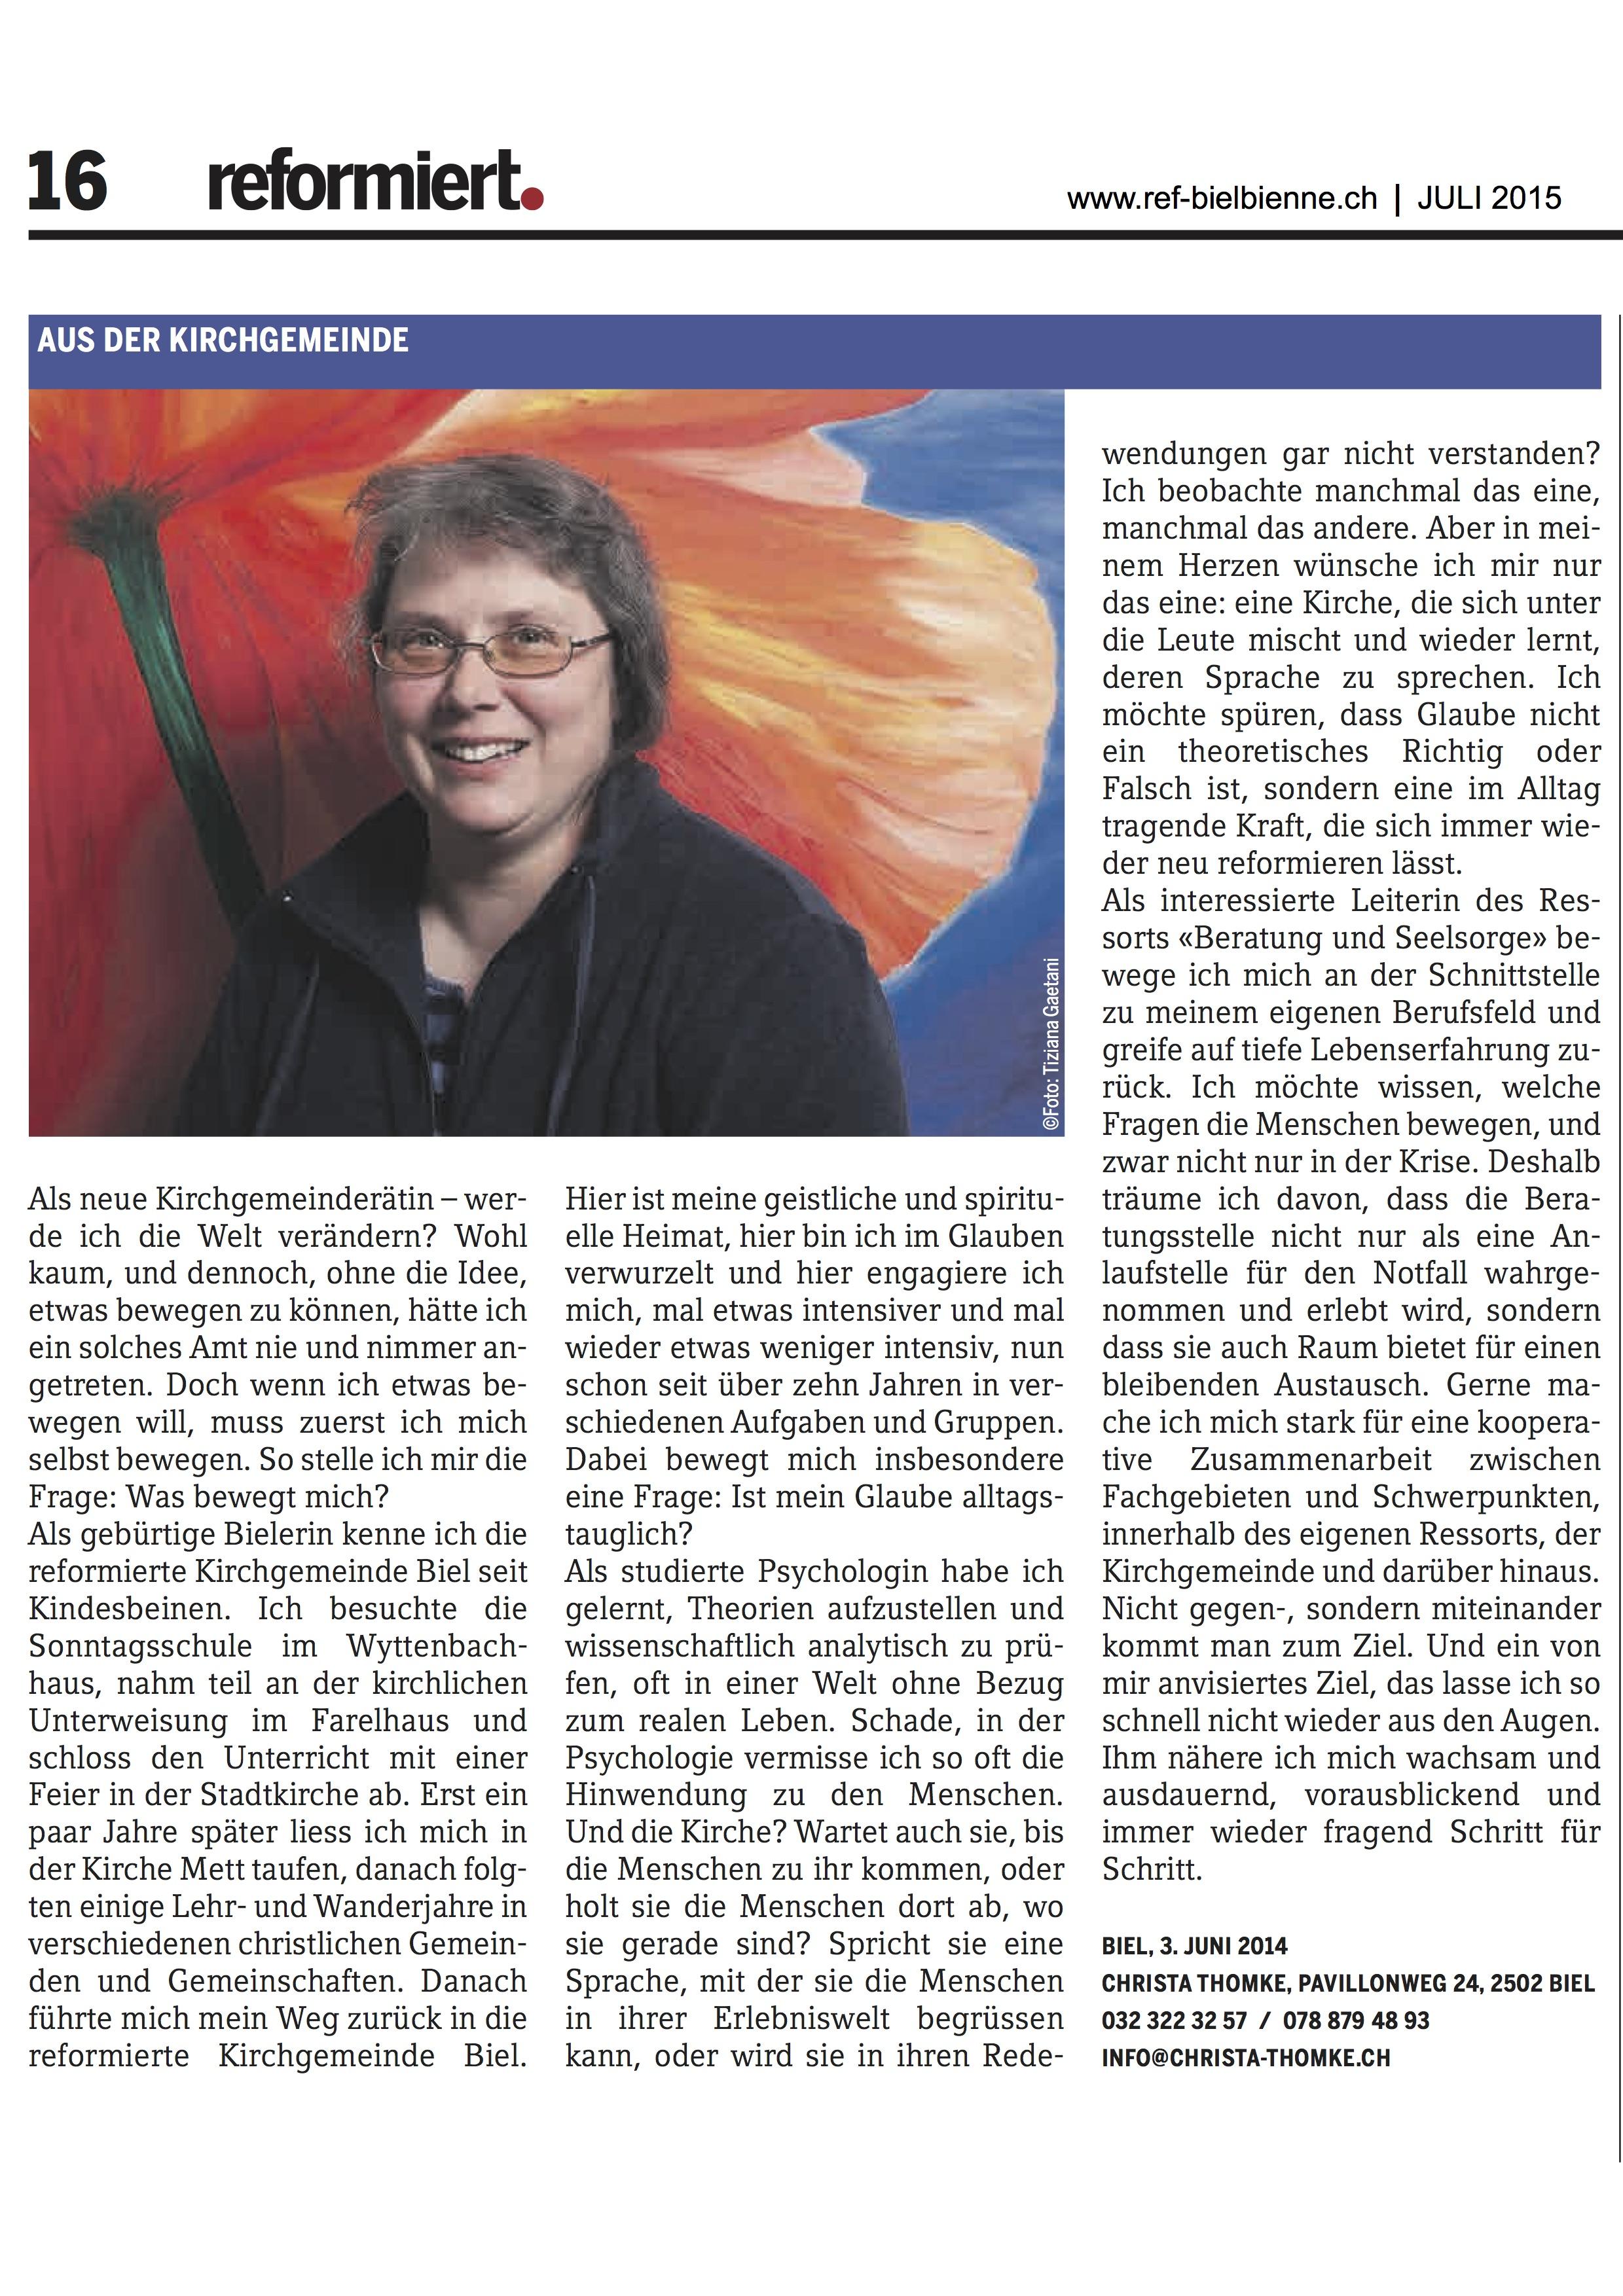 © reformiert. (Bieler Ausgabe), Juli 2015, S. 16